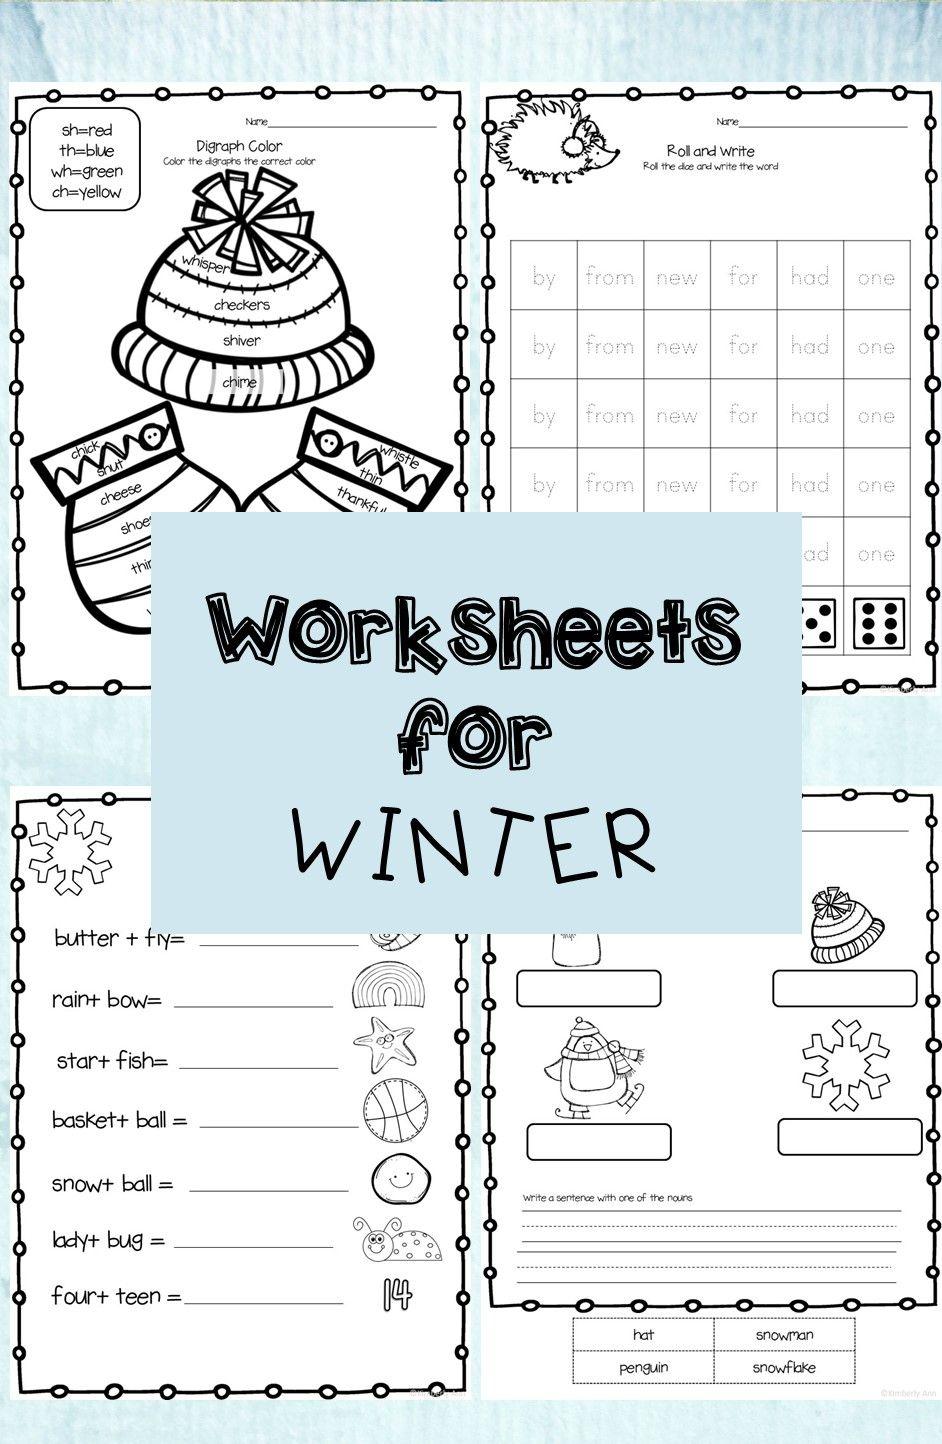 Winter Worksheets Math Worksheets Kindergarten Resources Writing Numbers [ 1444 x 942 Pixel ]